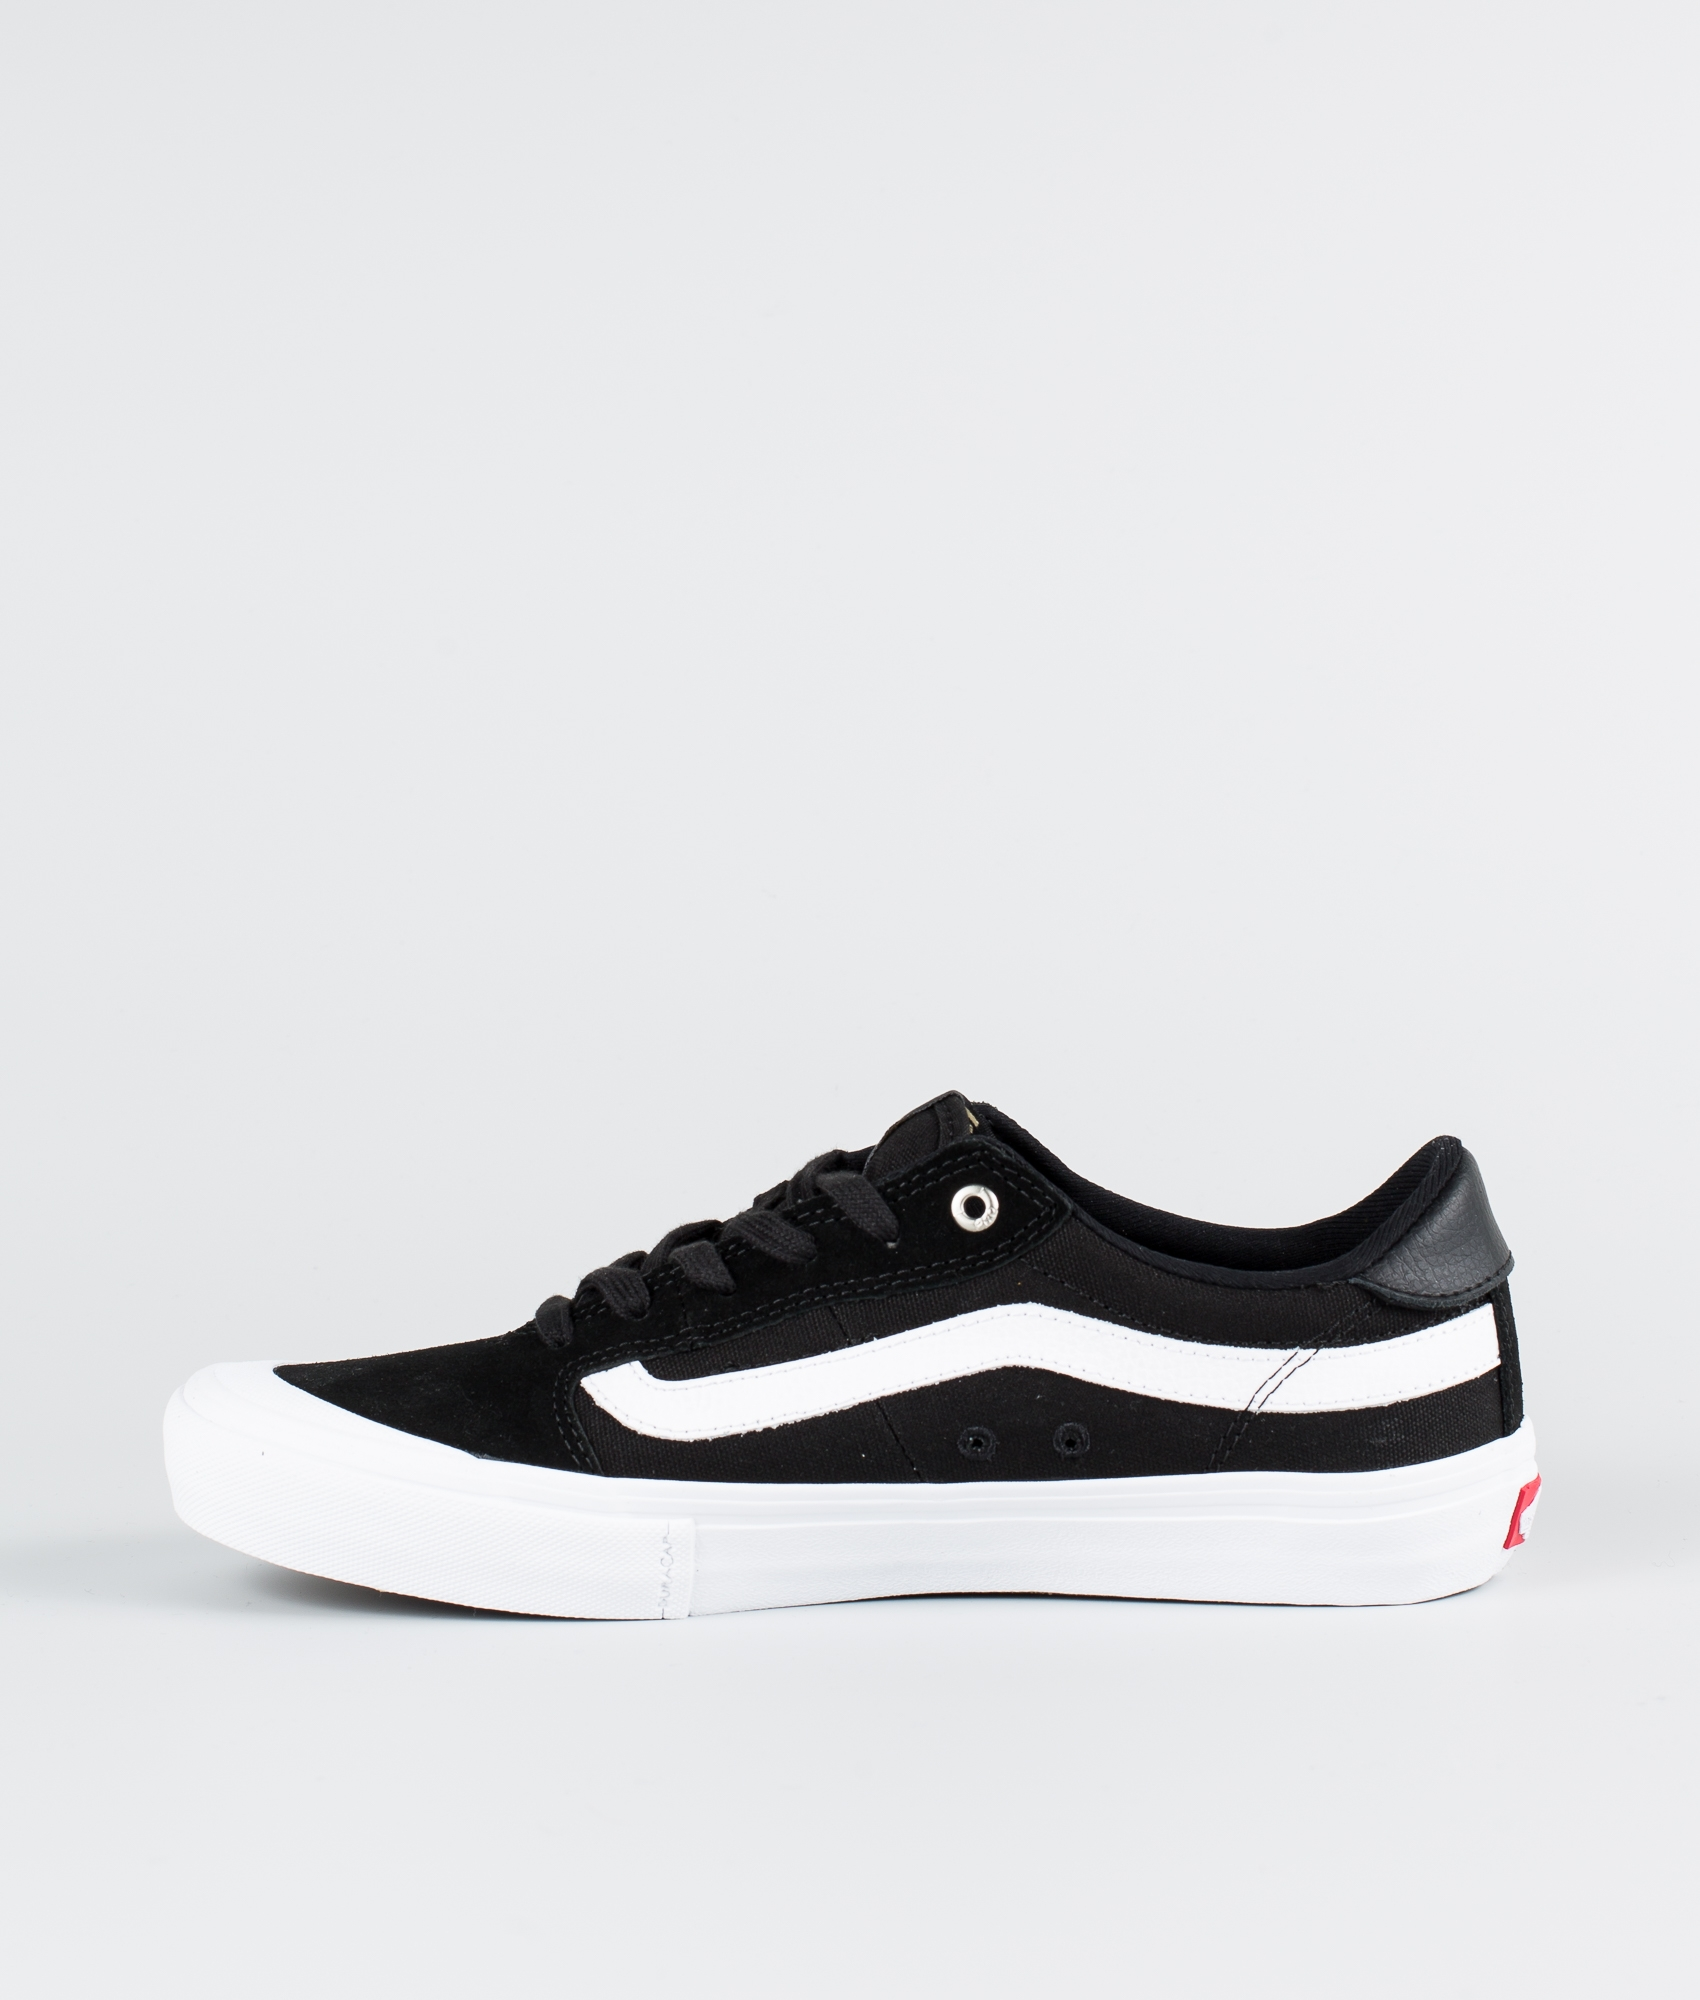 Vans Style 112 Pro Schuhe BlackWhiteKhaki